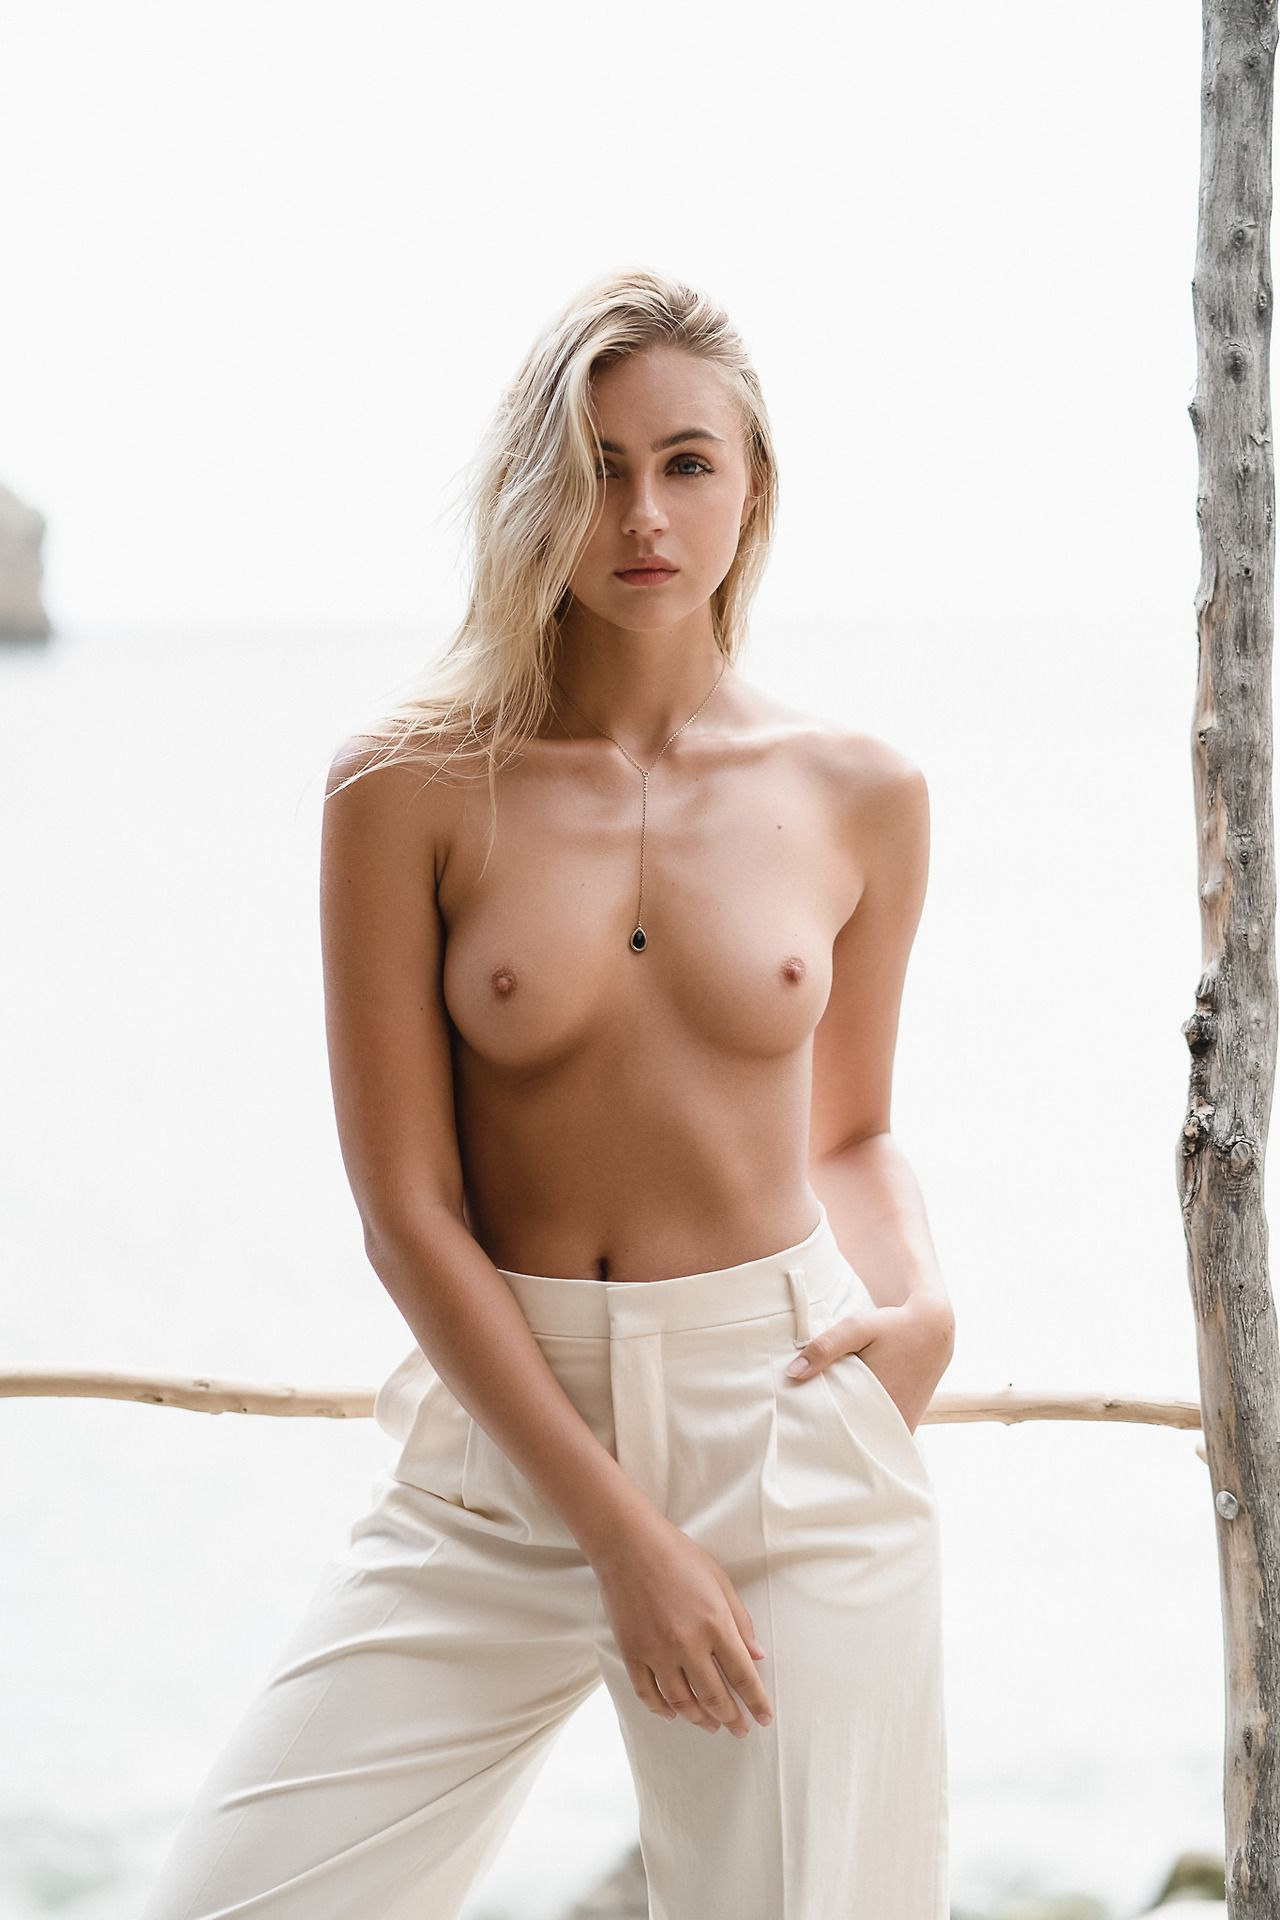 Reese witherspoon in twilight,Paris hilton braless 7 Photos Erotic nude Rita ora at memorial service for franca sozzani in milan,Gigi hadid boobs